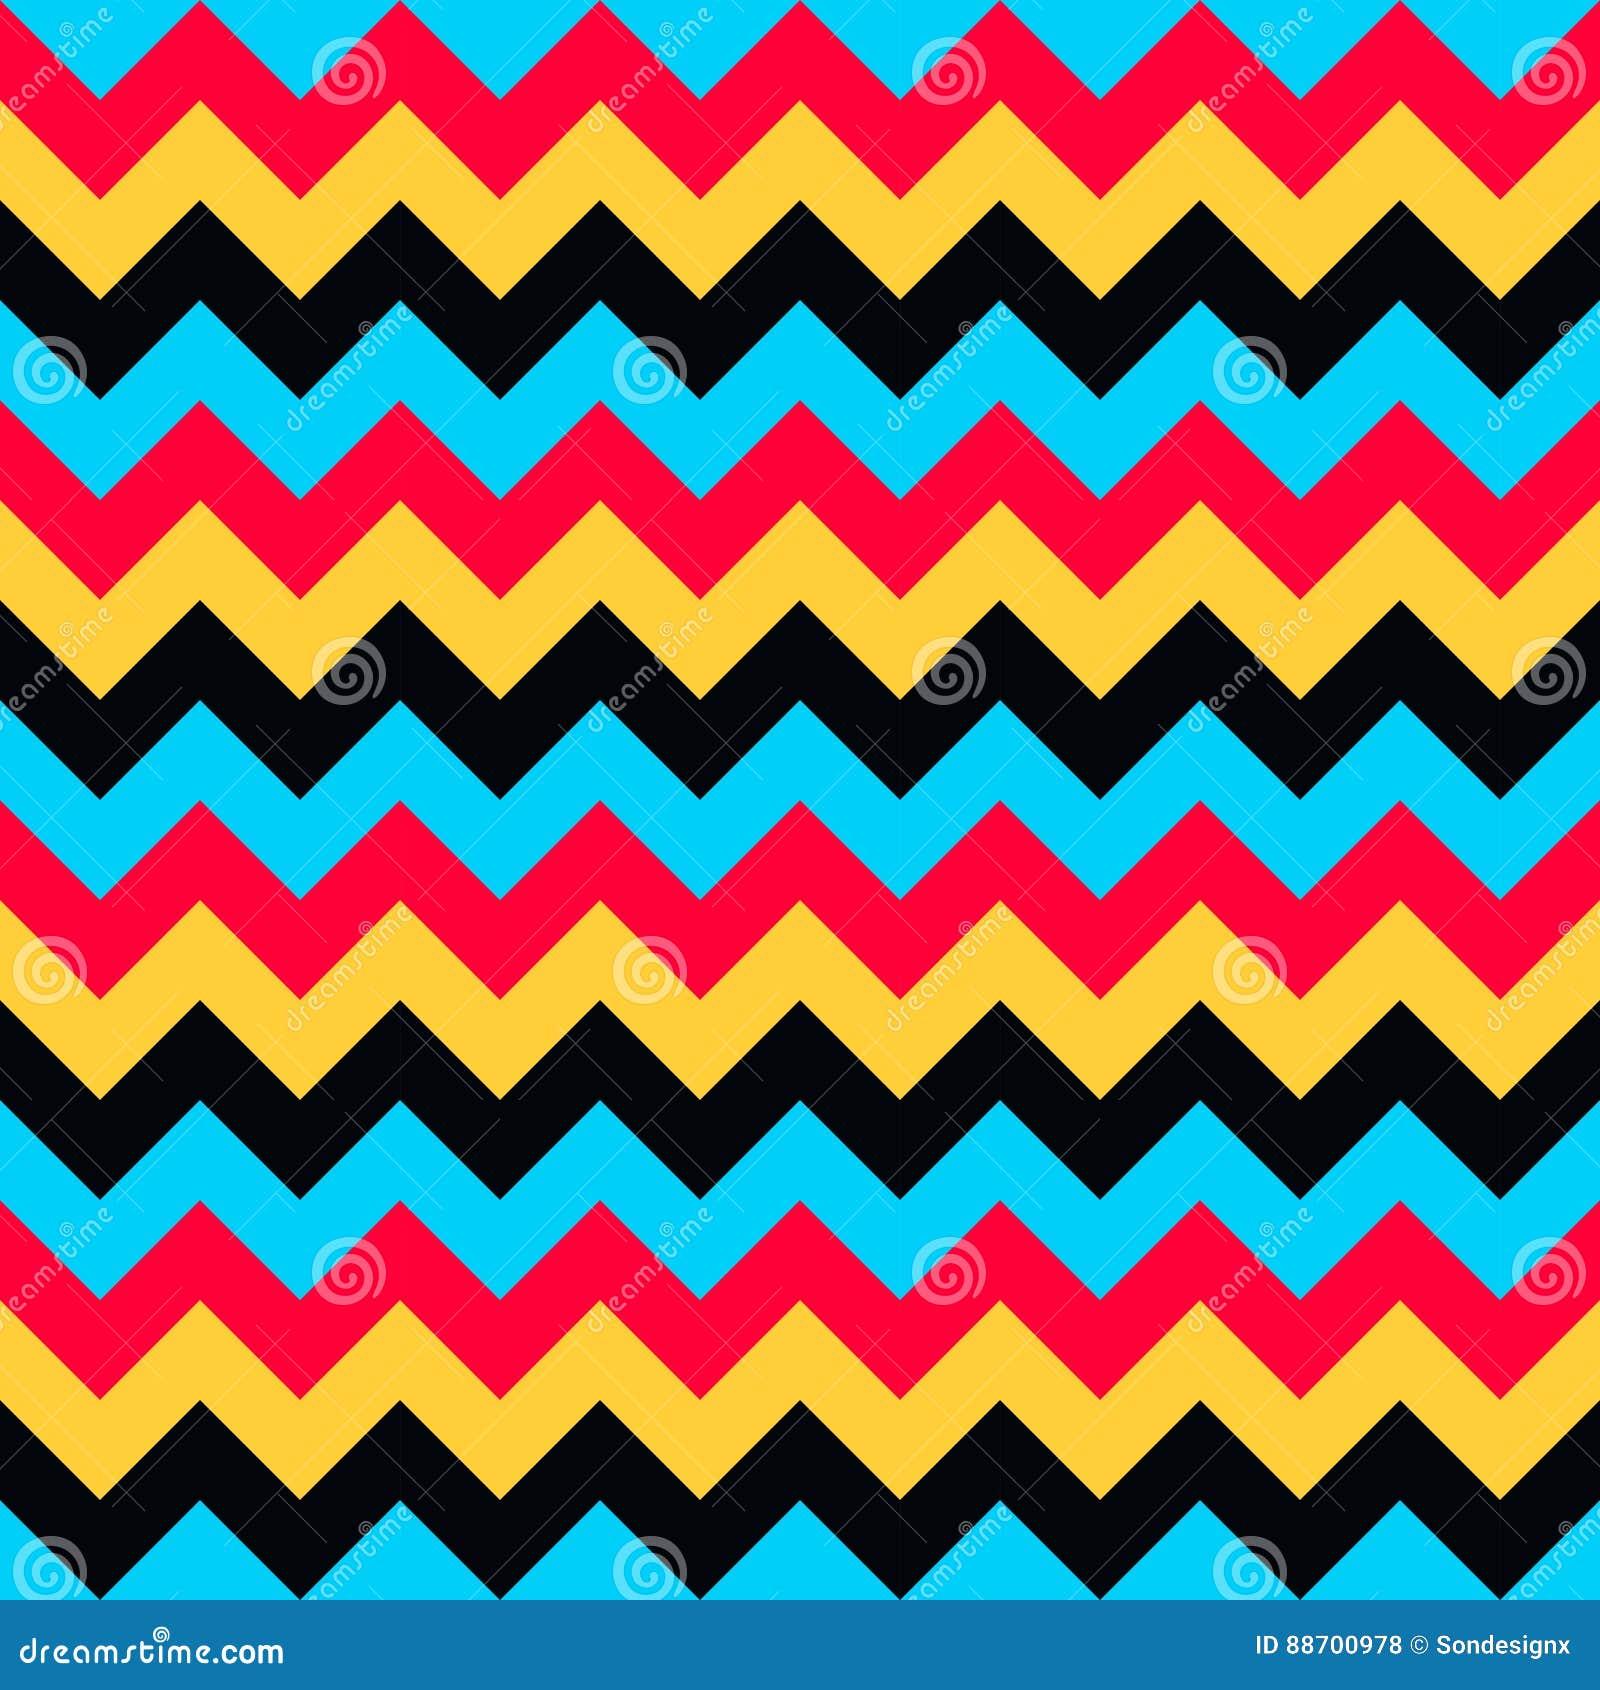 chevron pattern seamless vector arrows geometric design colorful rh dreamstime com  chevron pattern vector download